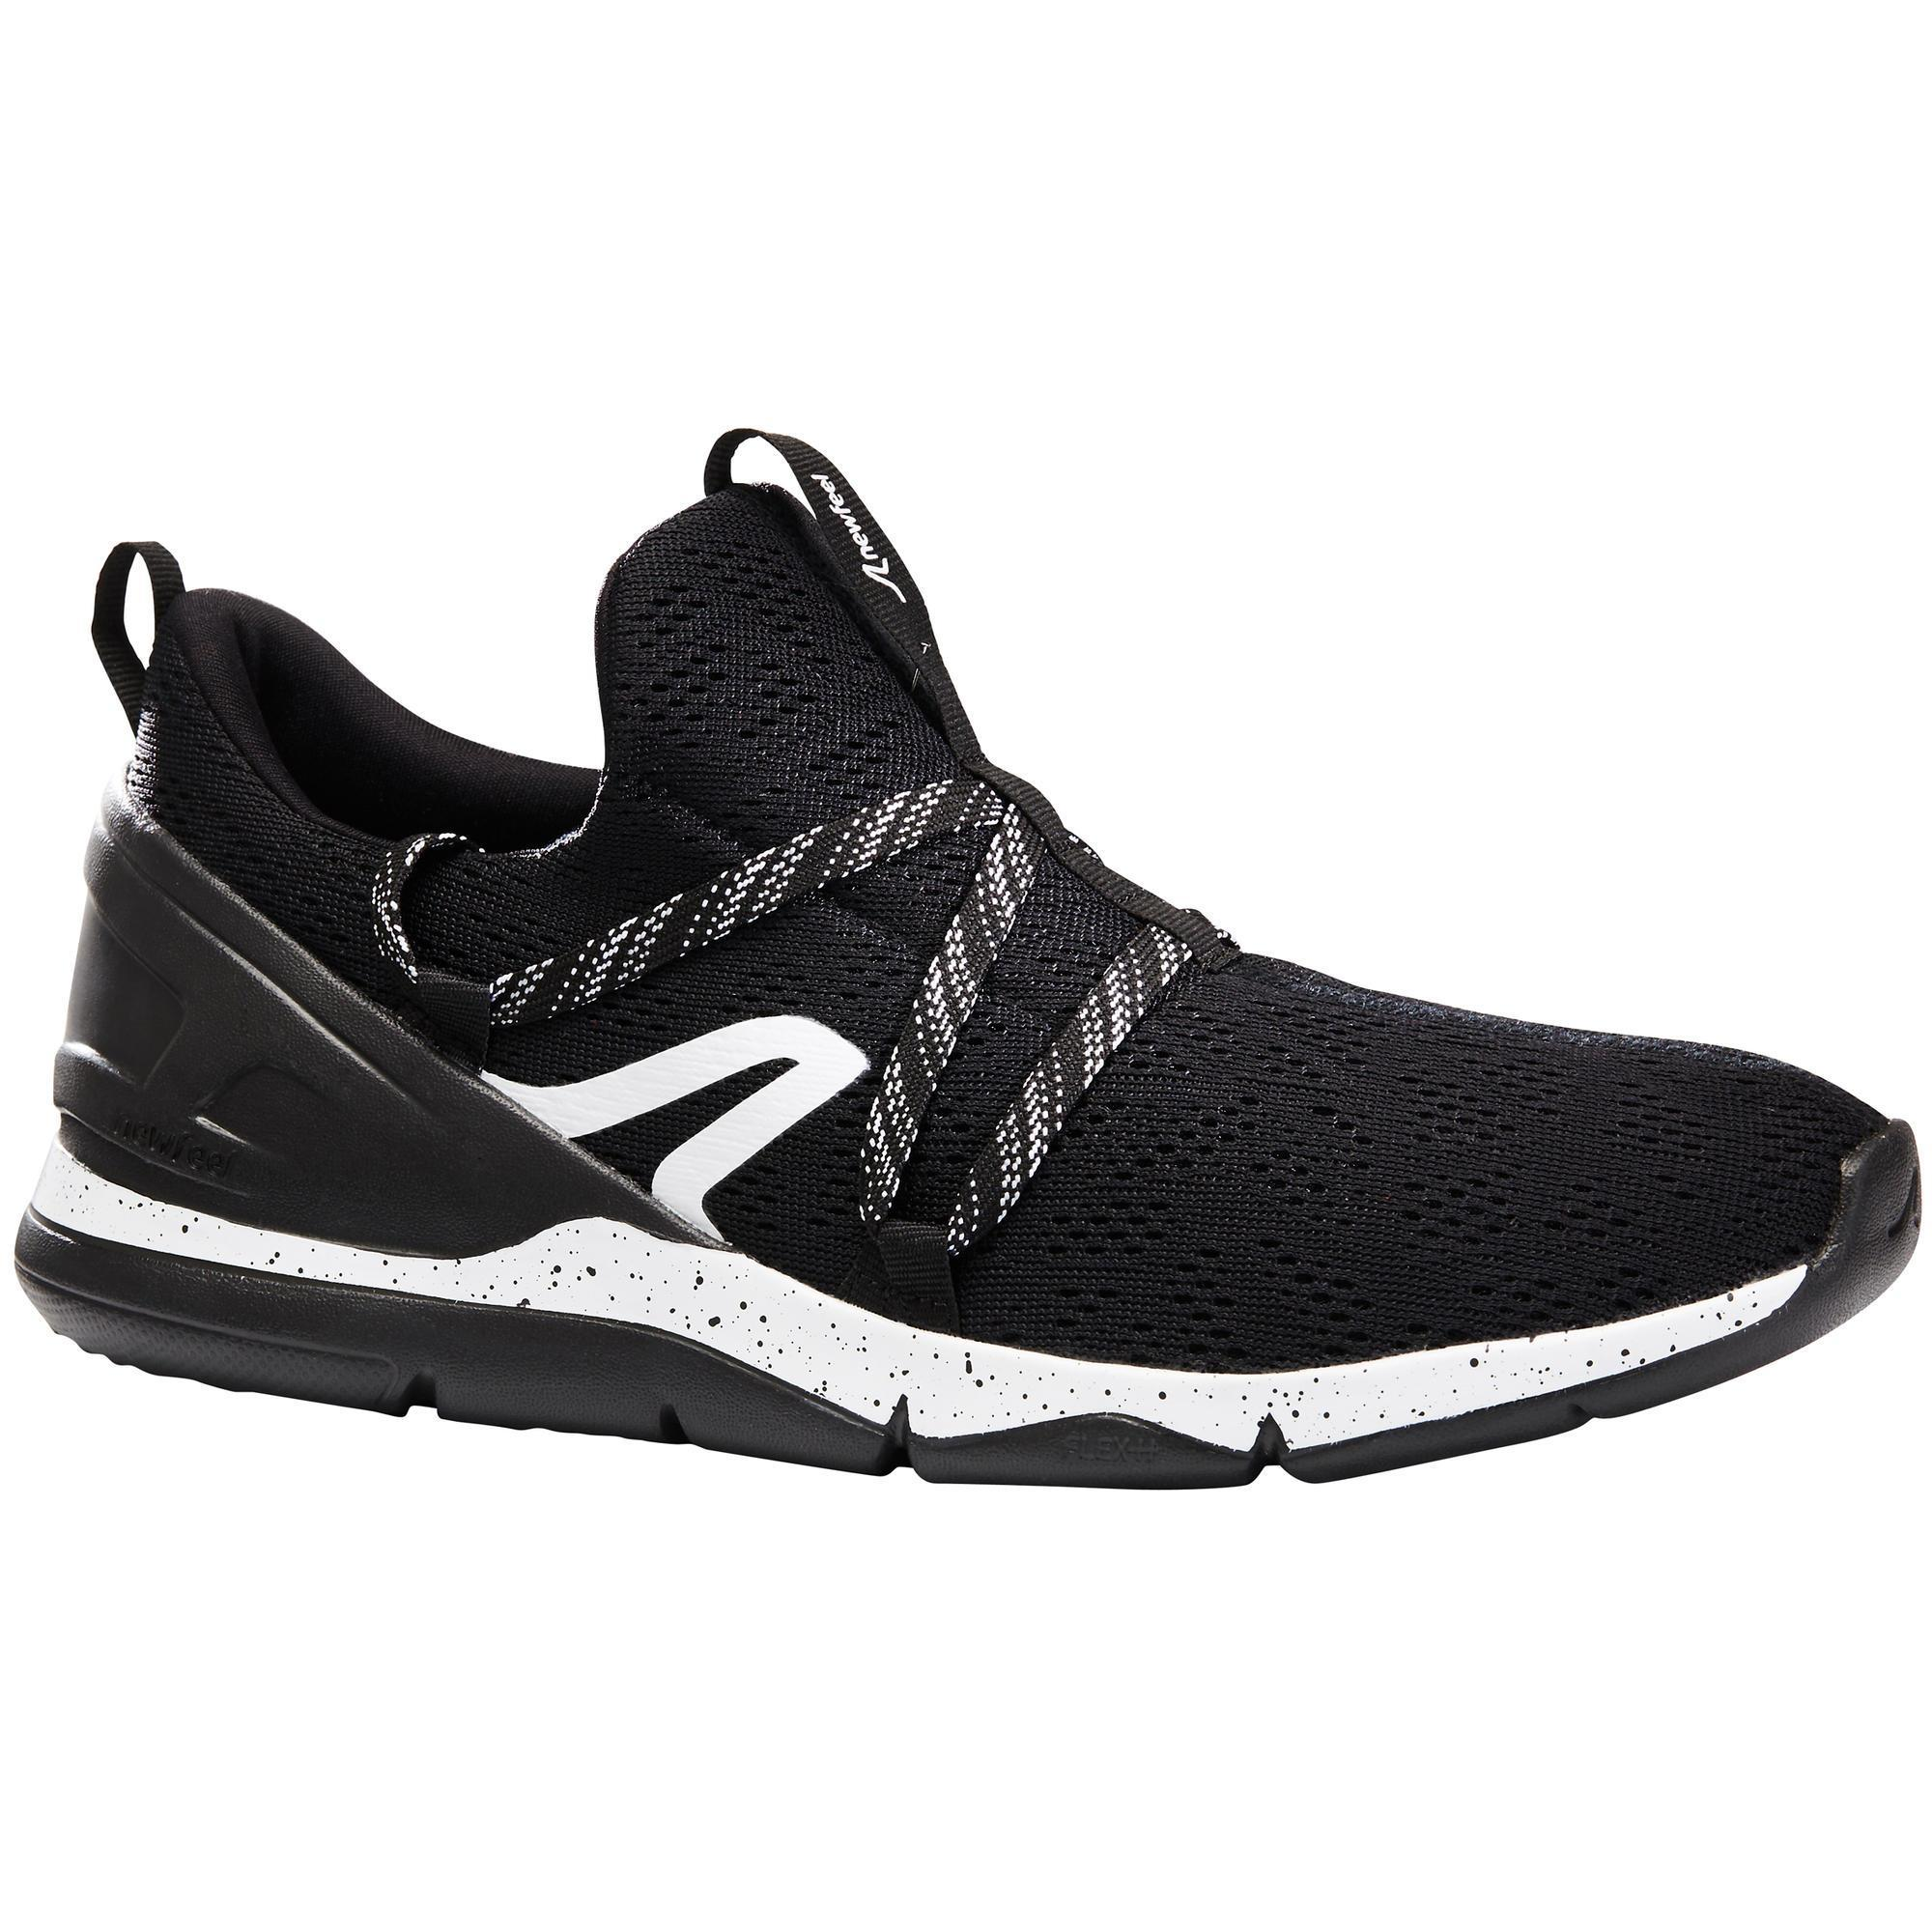 9b380b1744 Scarpe uomo - Scarpe camminata sportiva uomo PW140 nero-bianco